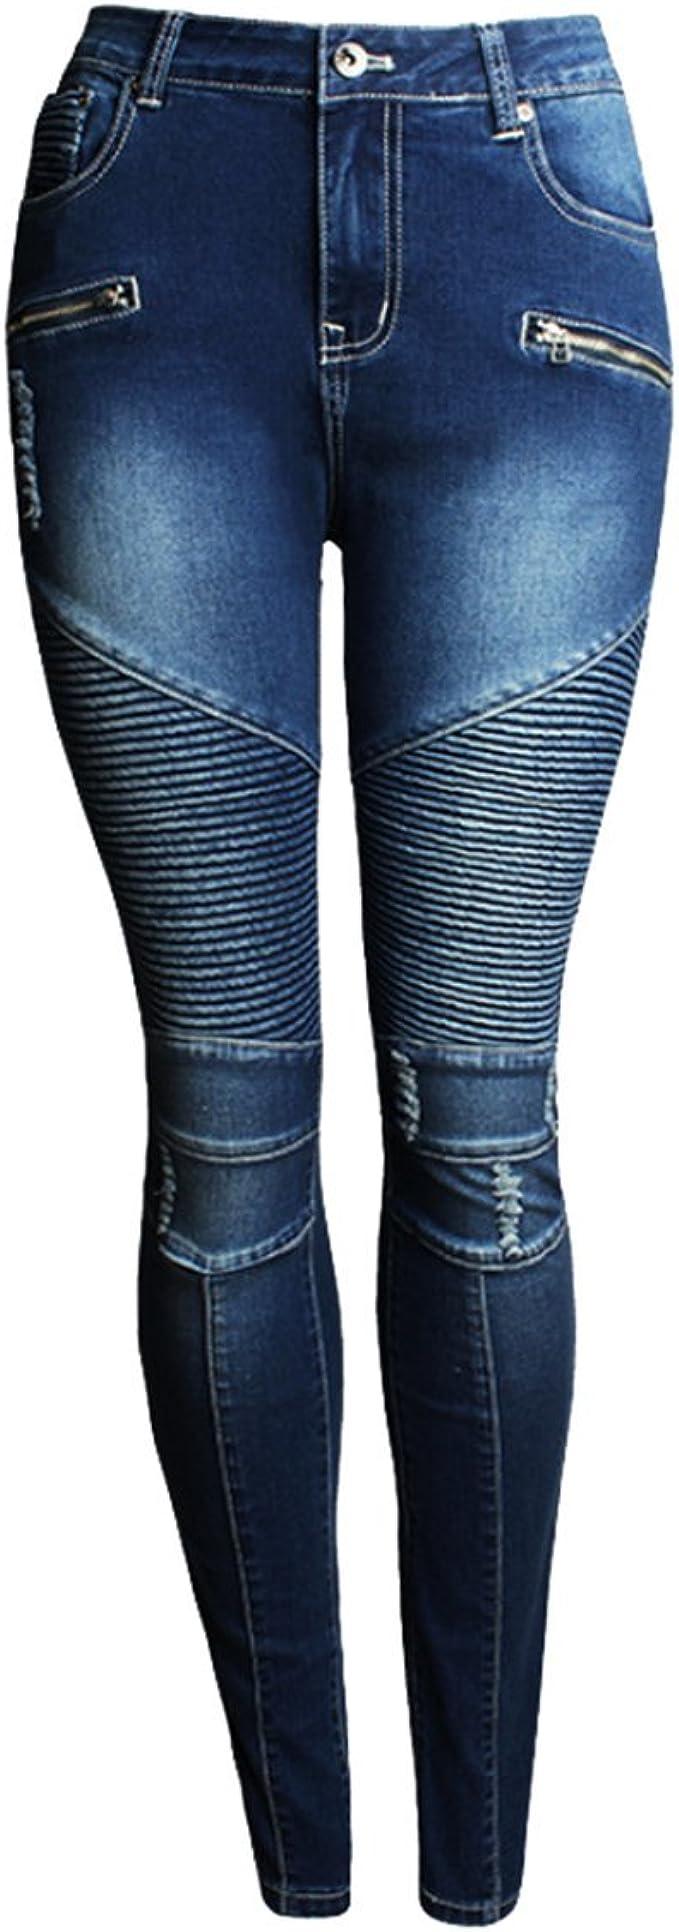 Lyamazing Women`s Stretchy Ripped Skinny Biker Jeans Blue Mid Low Waist Denim Pants